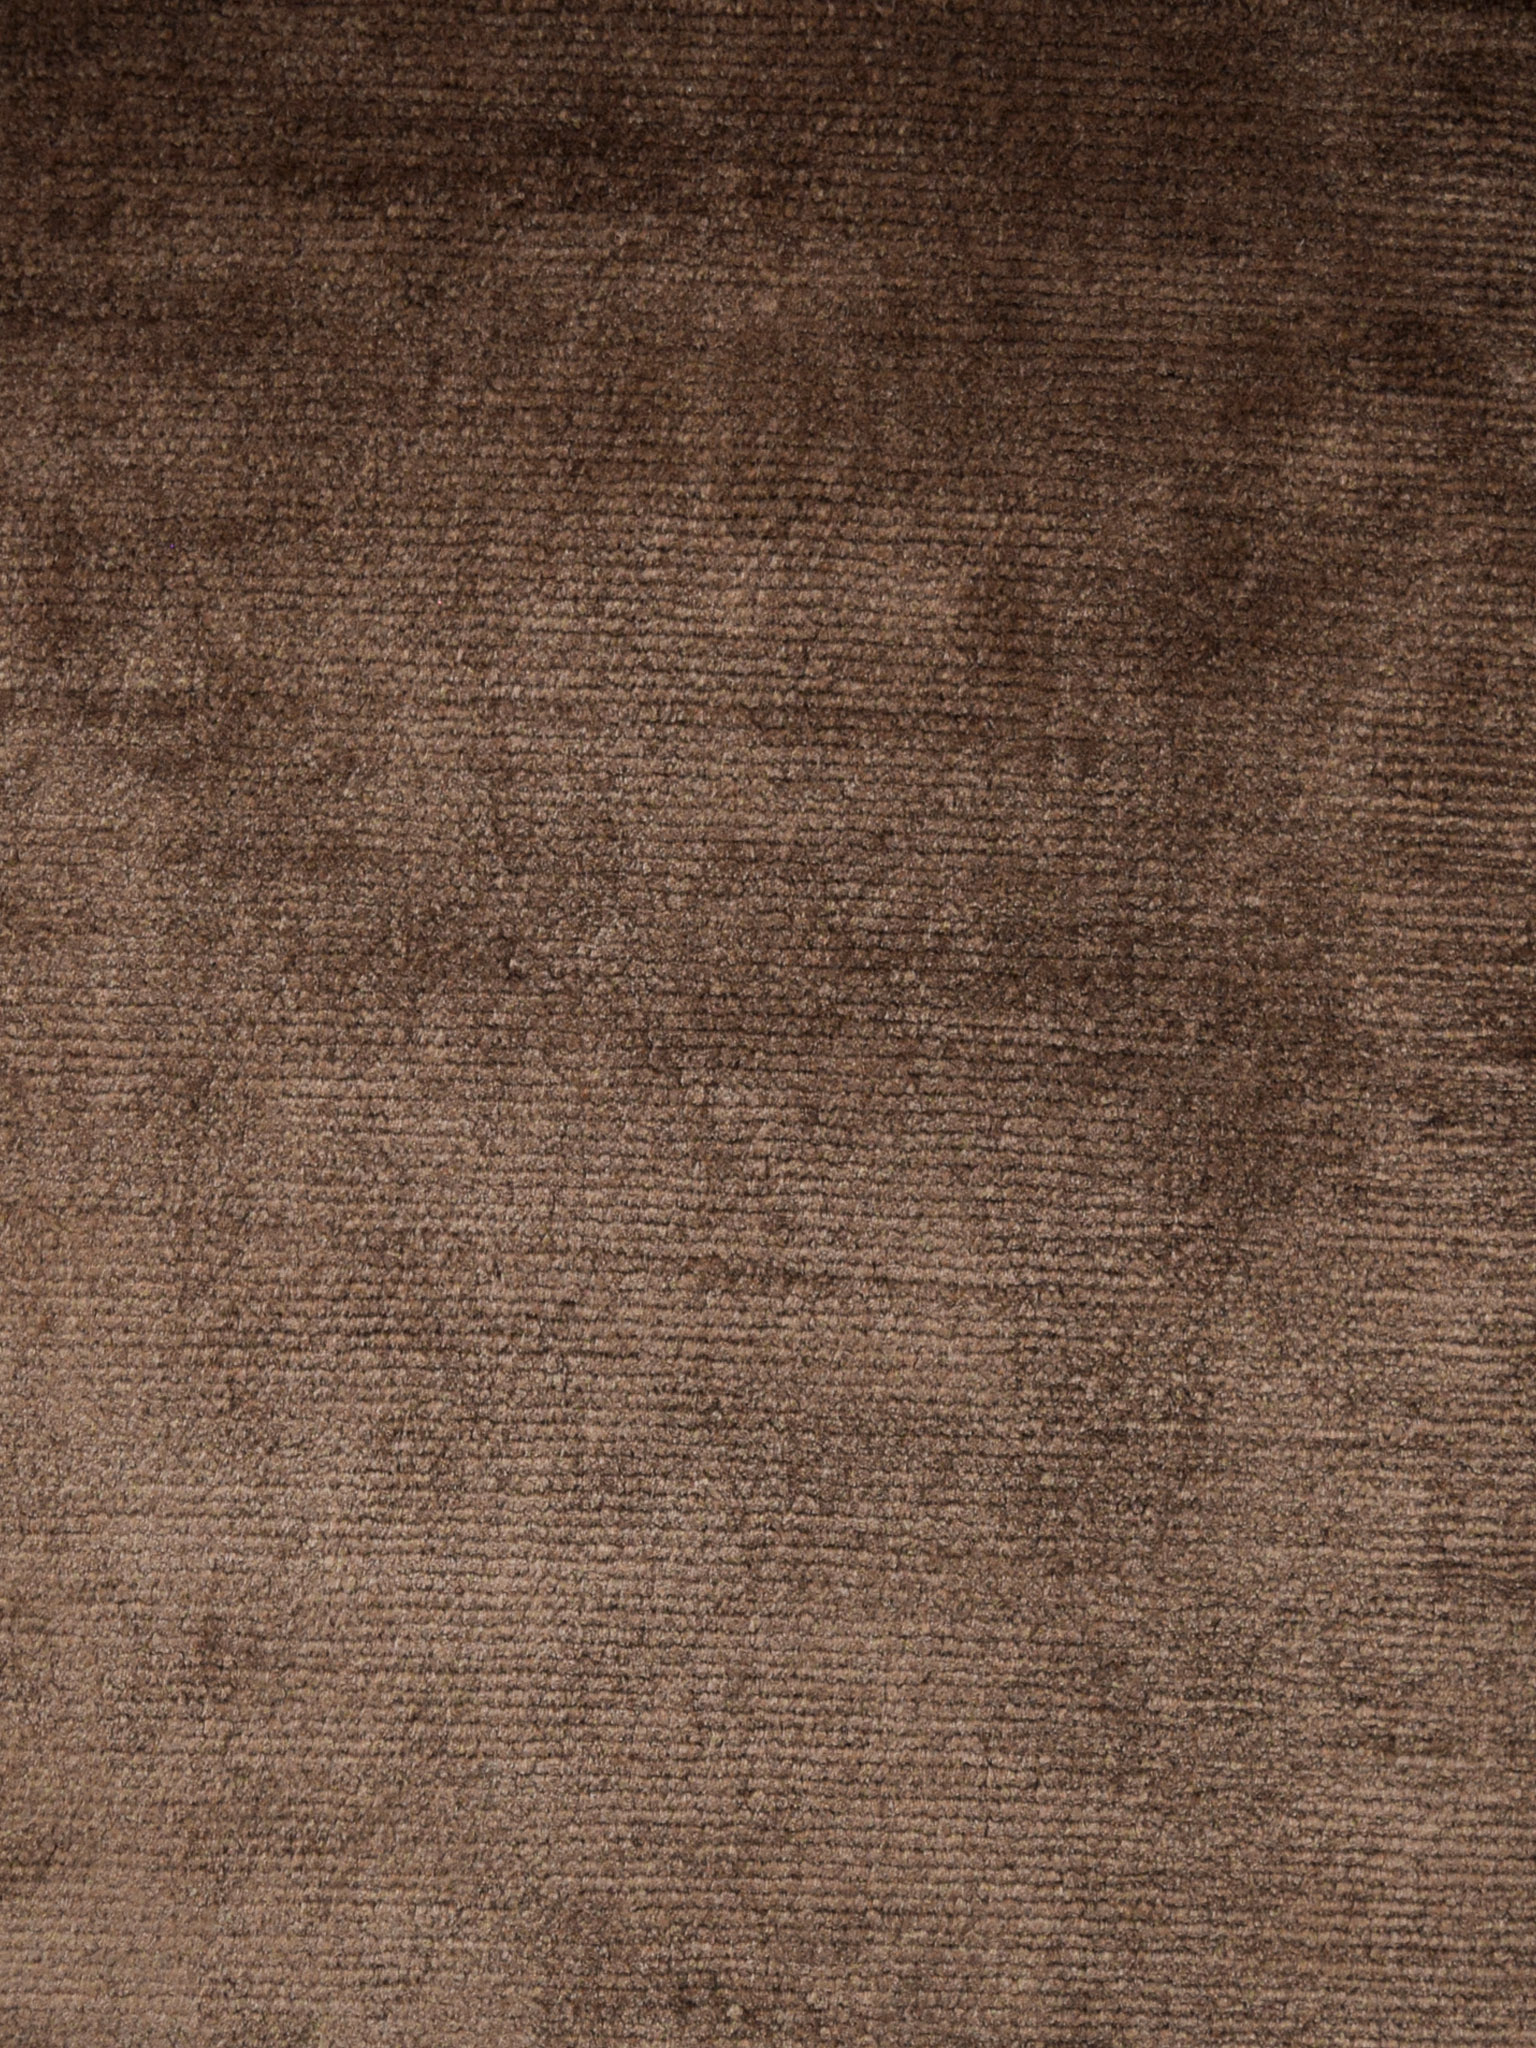 Muga Silk Solid HSPSA16113/317